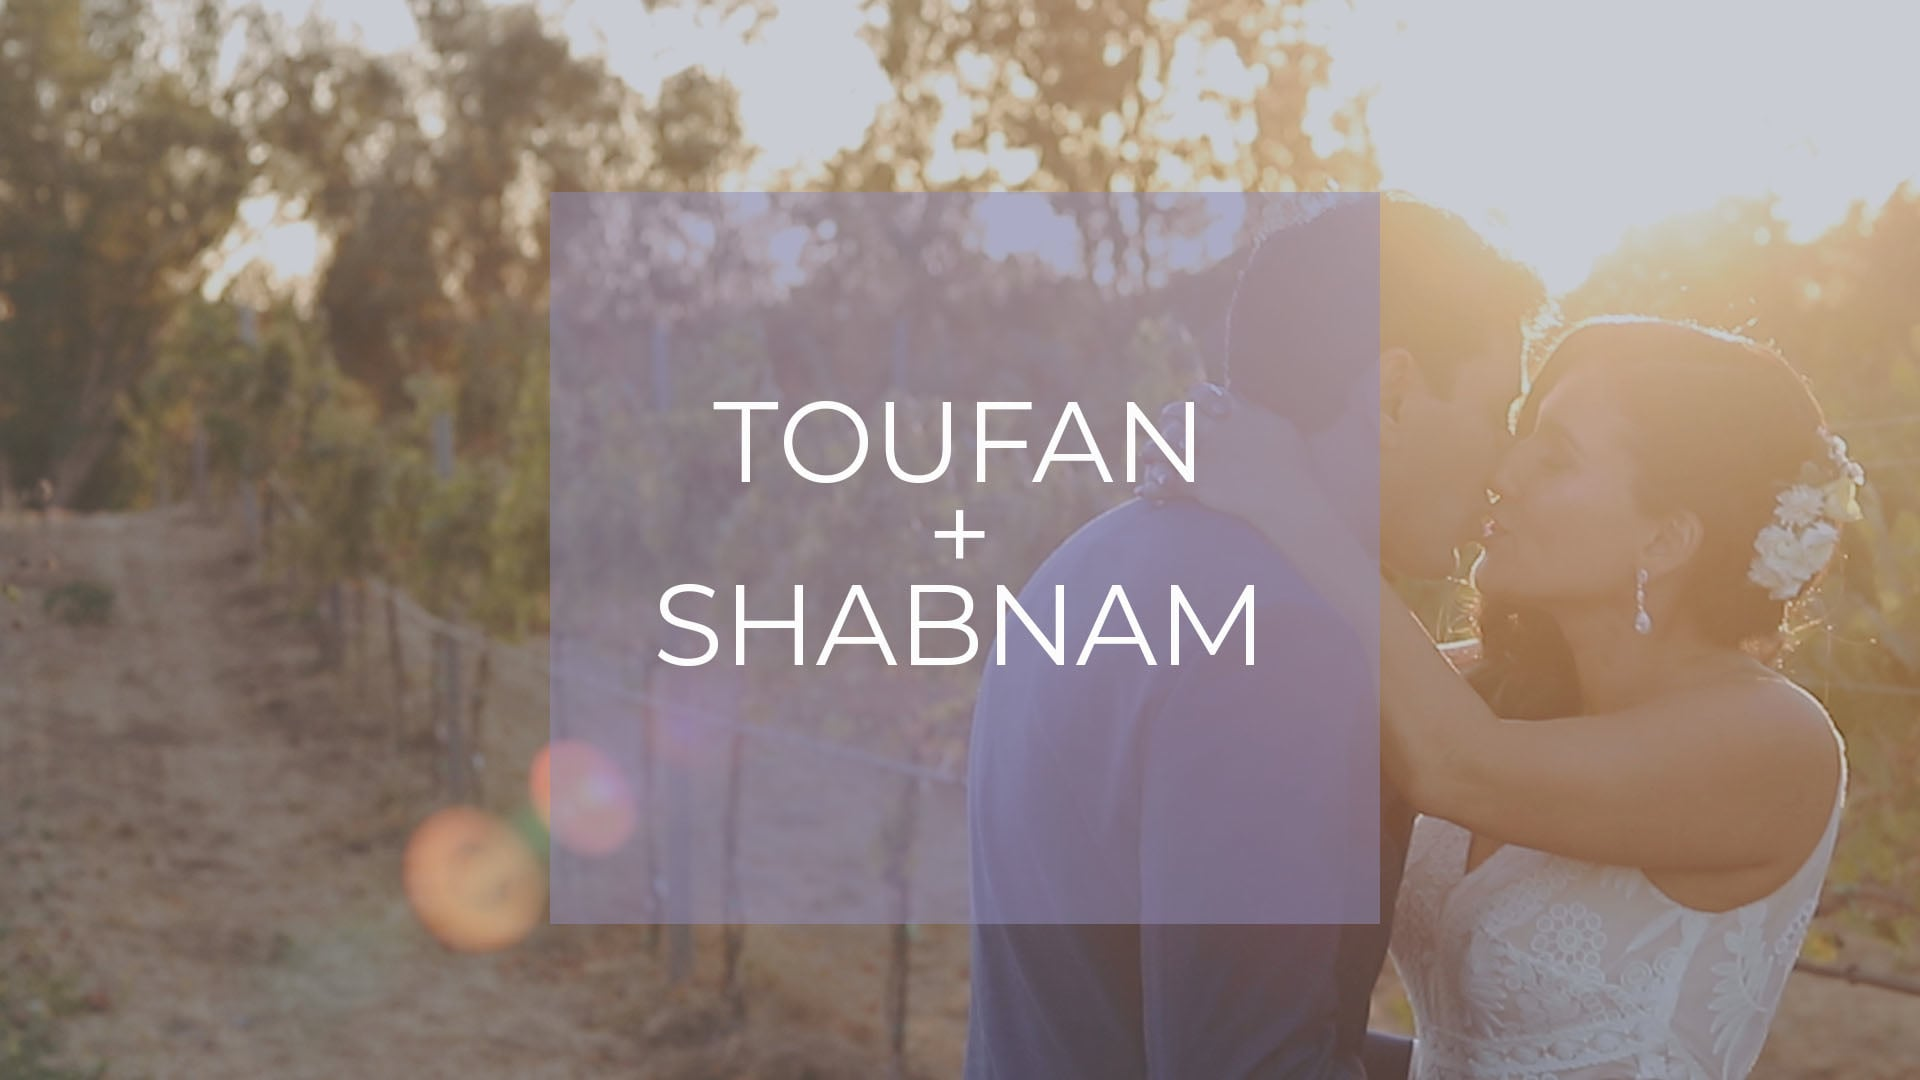 Toufan + Shabnam